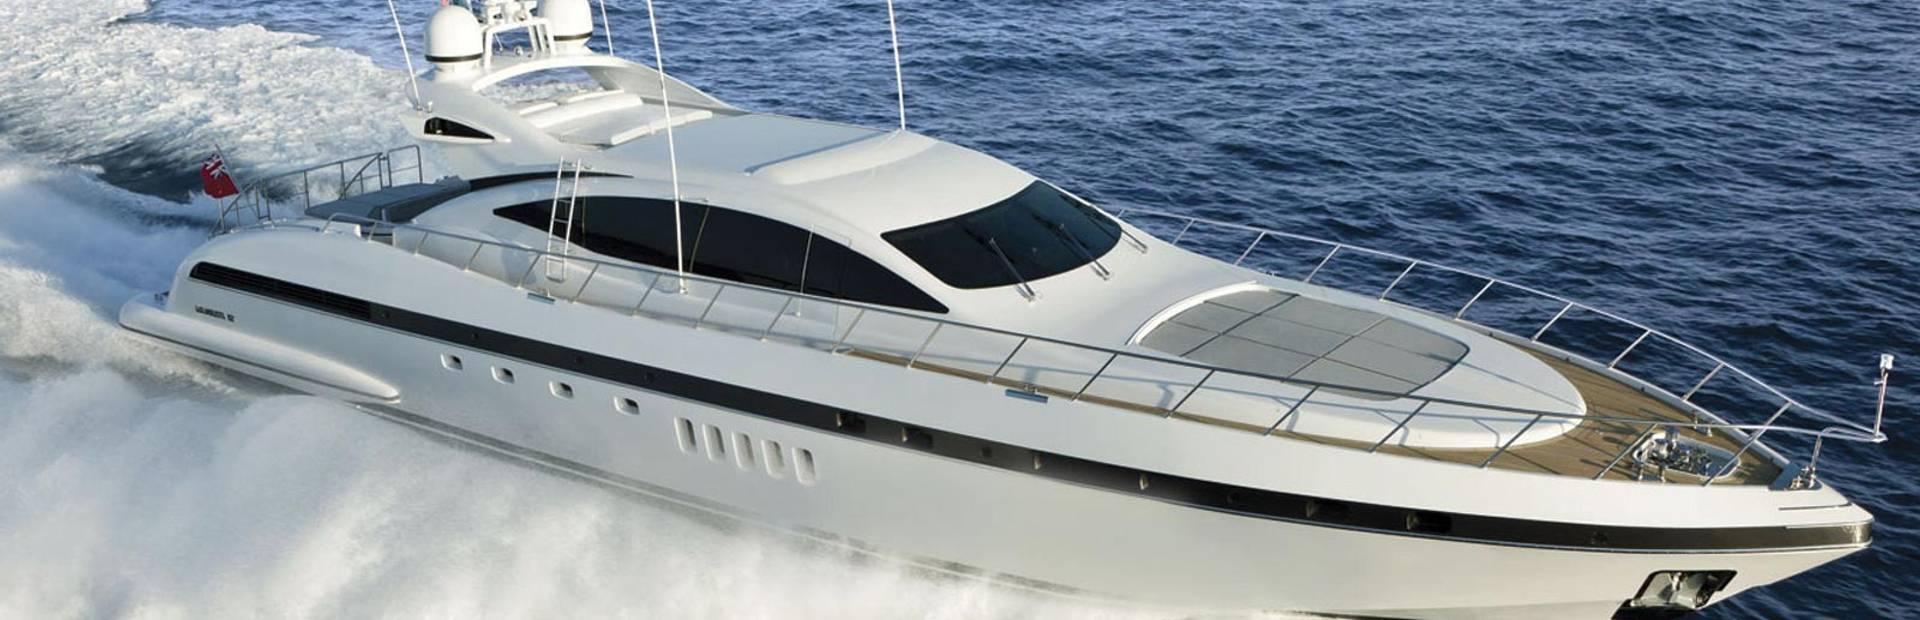 Mangusta 92 Yacht Charter